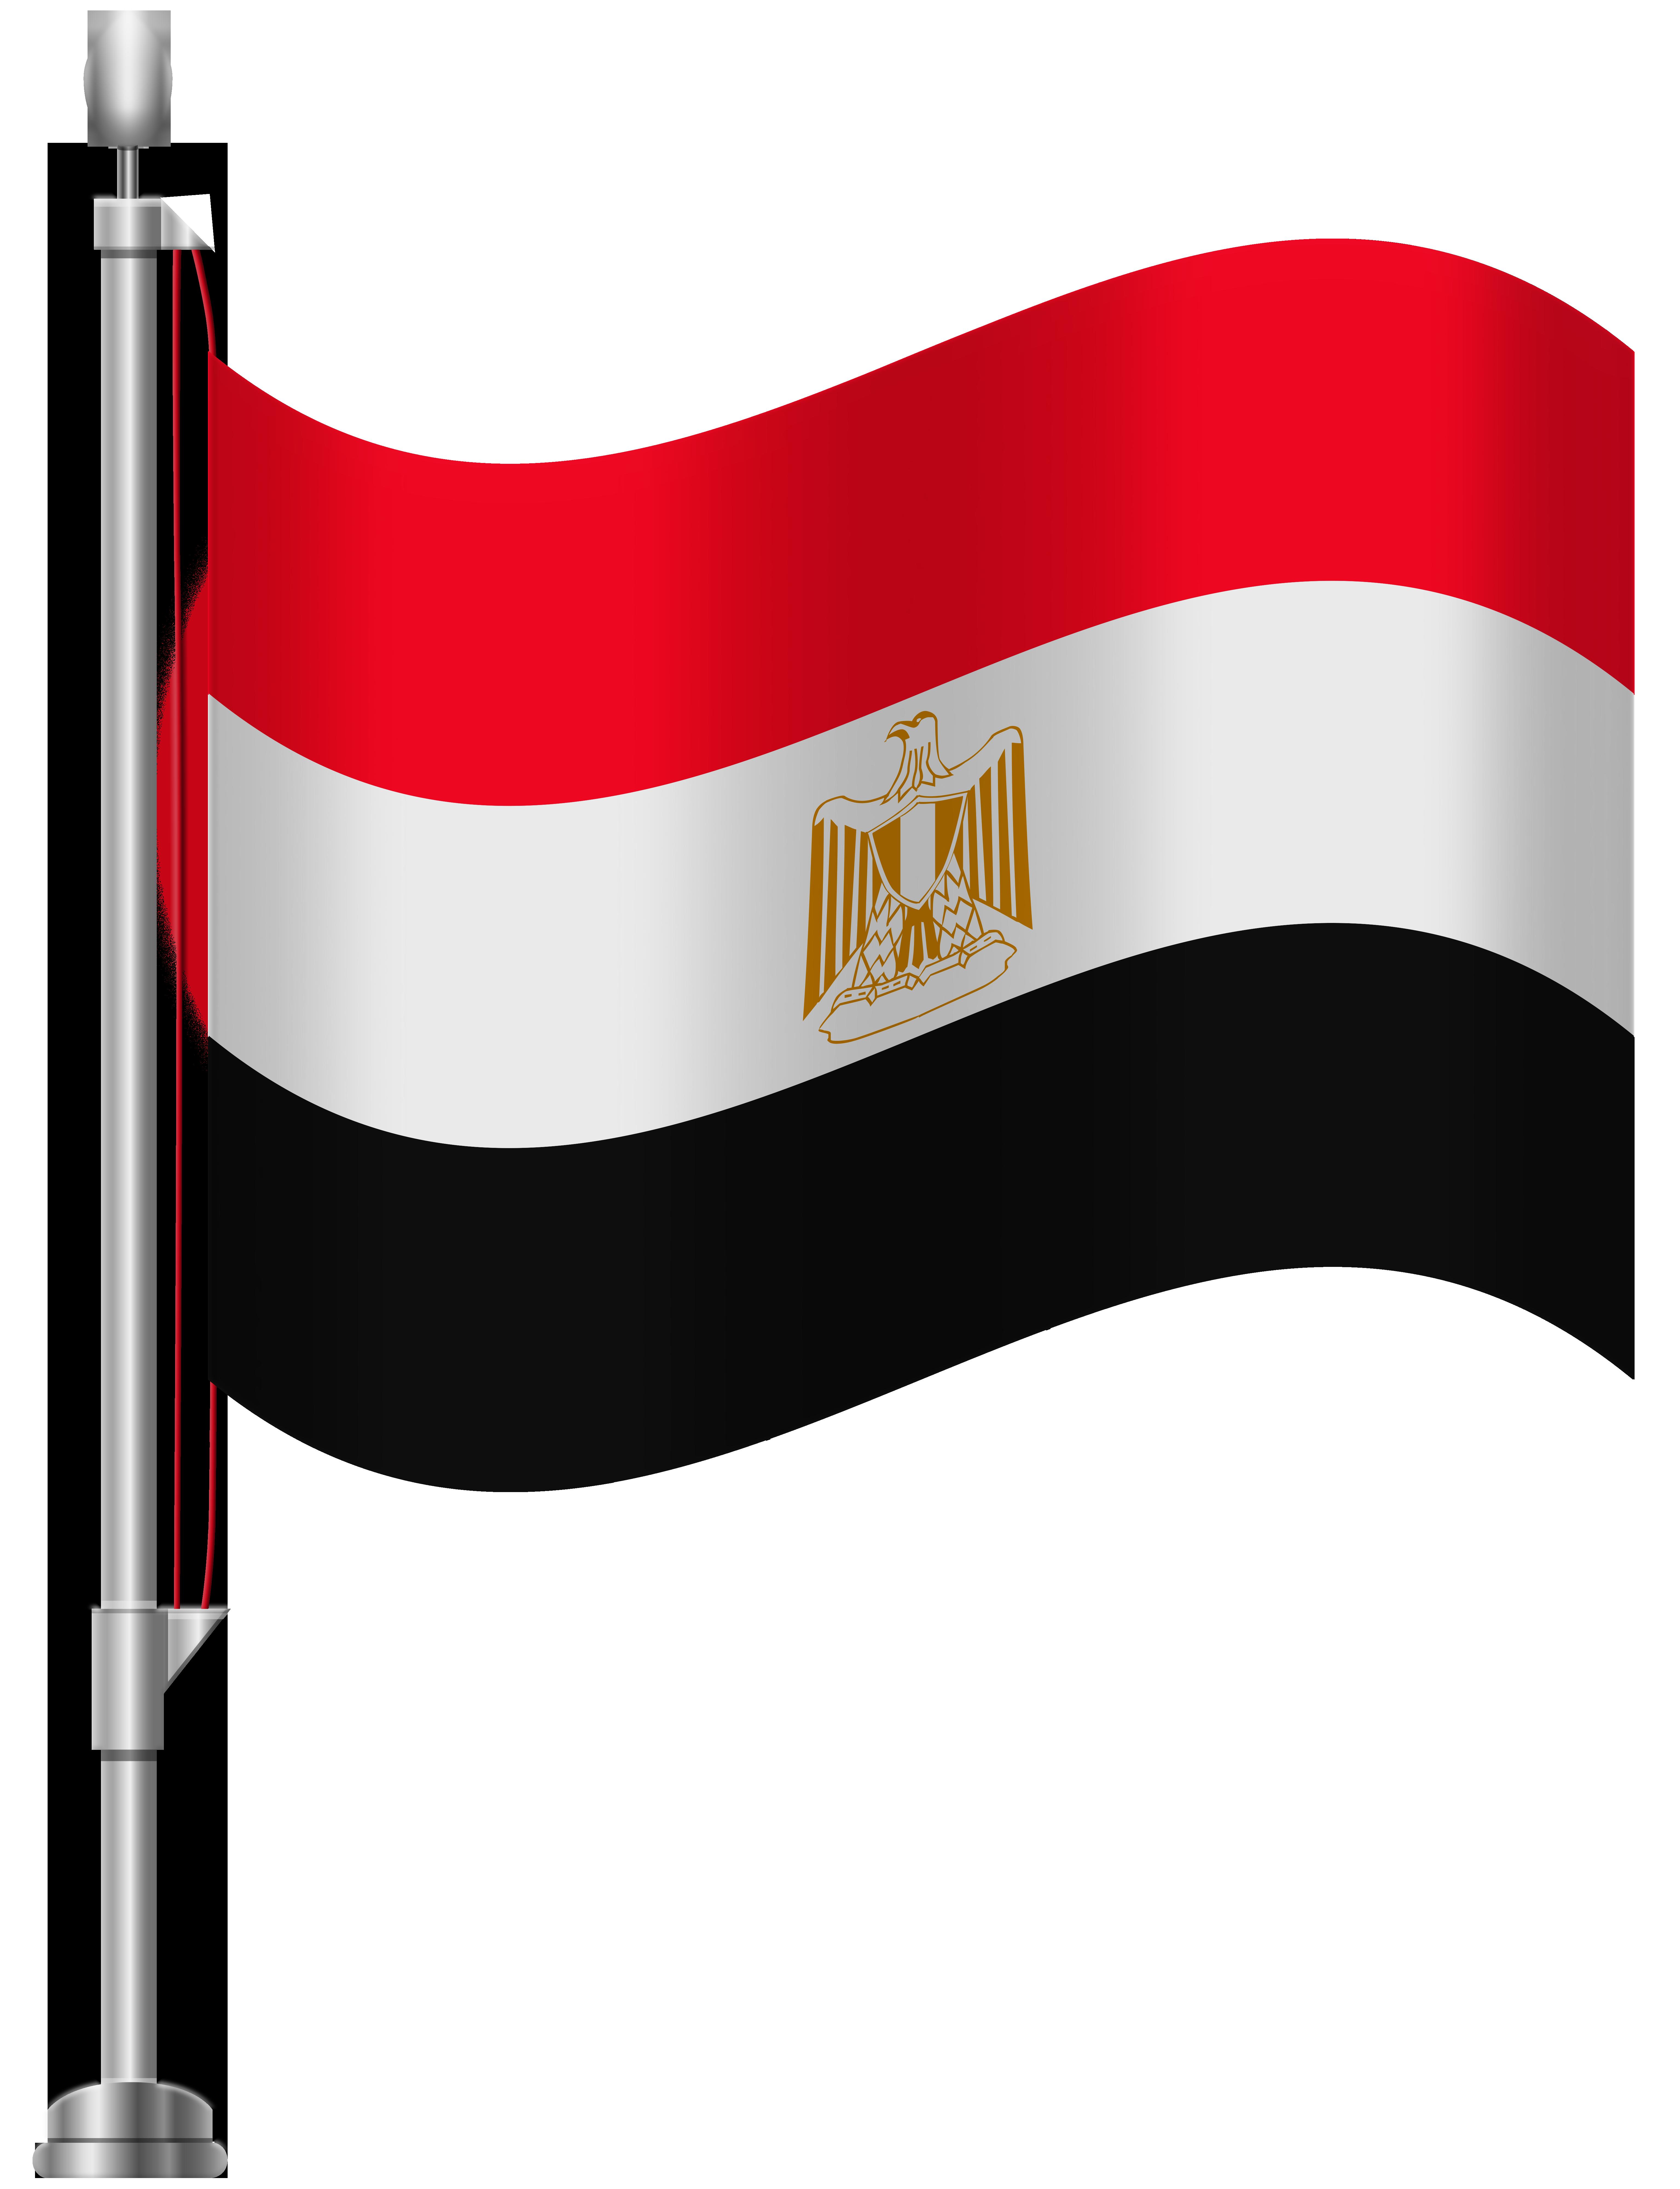 Egyptian clipart egyptian background. Pin by ibrahim zkaria